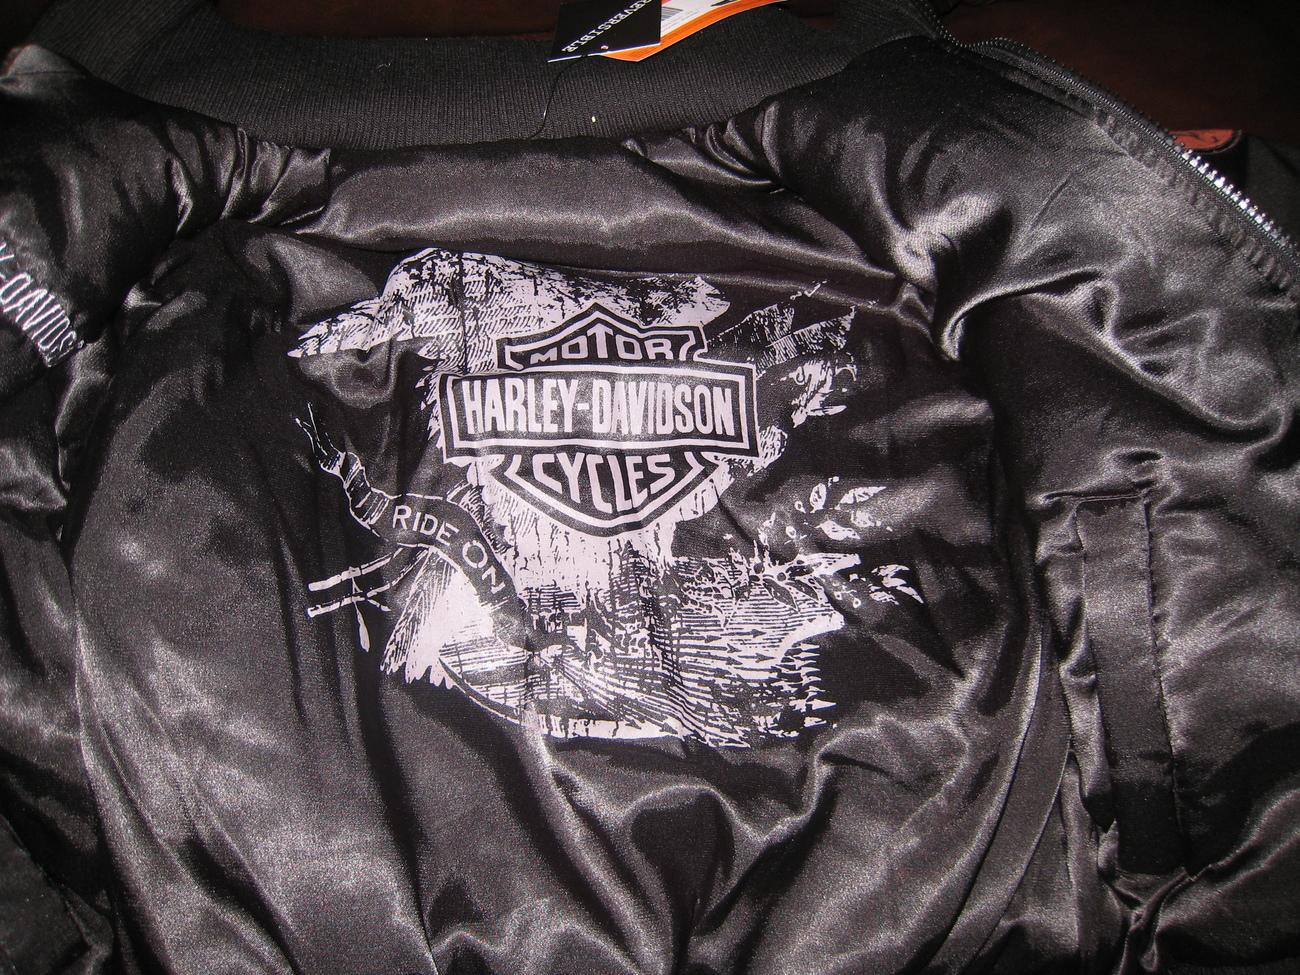 HARLEY DAVIDSON Black Reversible Jacket 4-7 5 6 NEW NwT